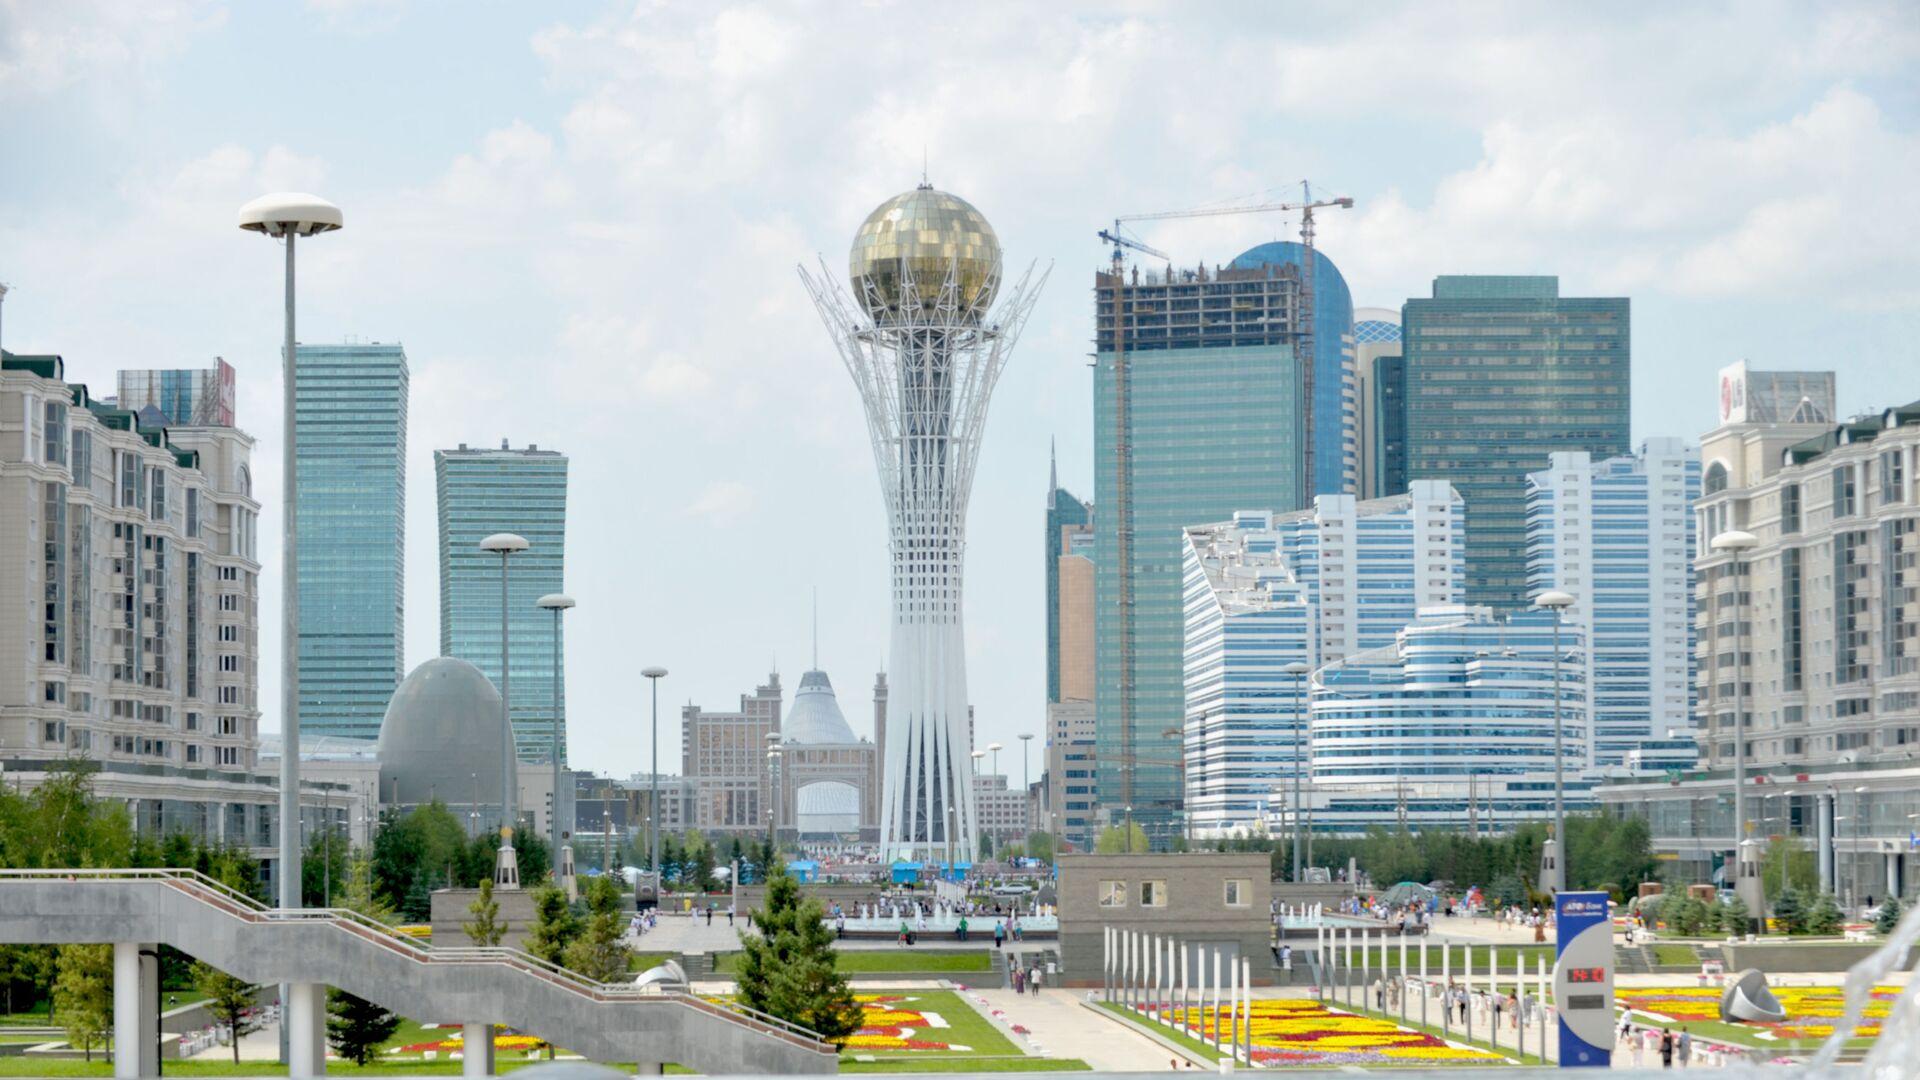 Astana, Kazachstan - Sputnik Polska, 1920, 08.07.2021